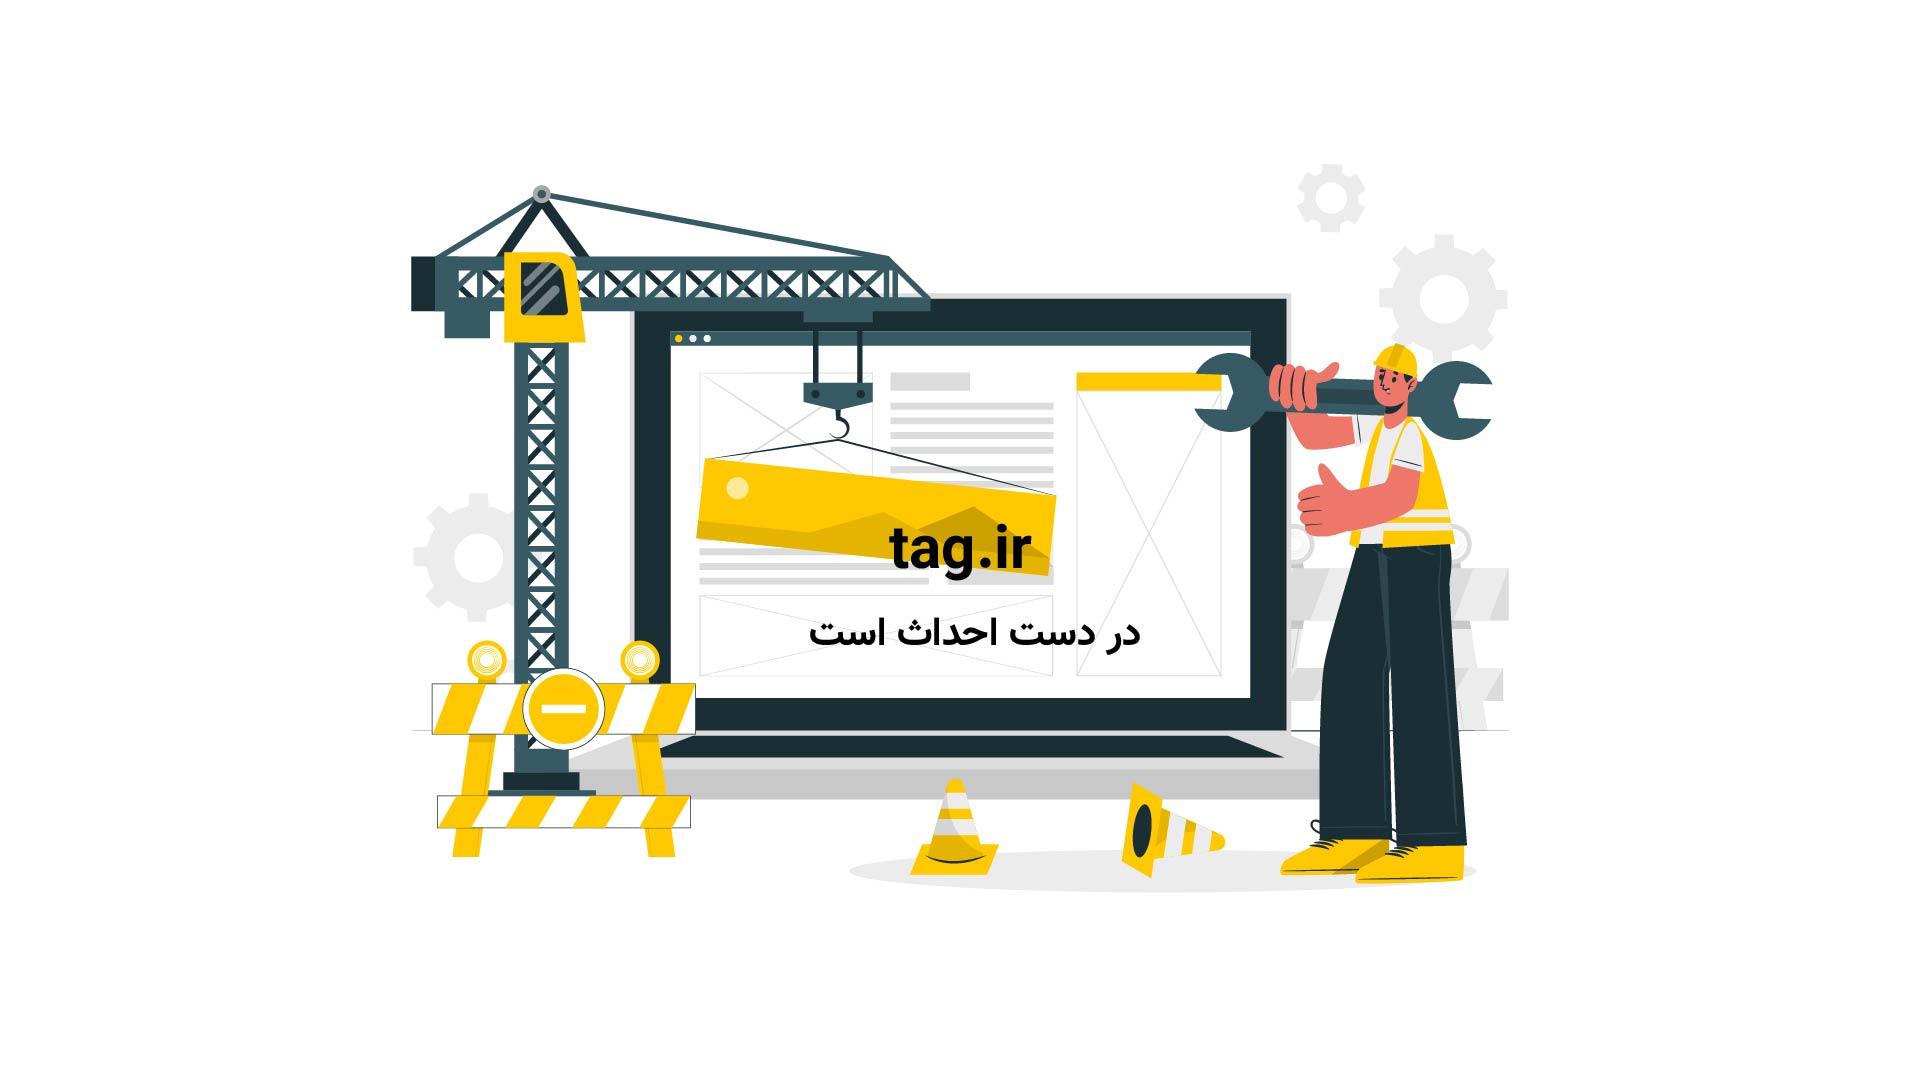 محمدرضا جوادی یگانه   تگ